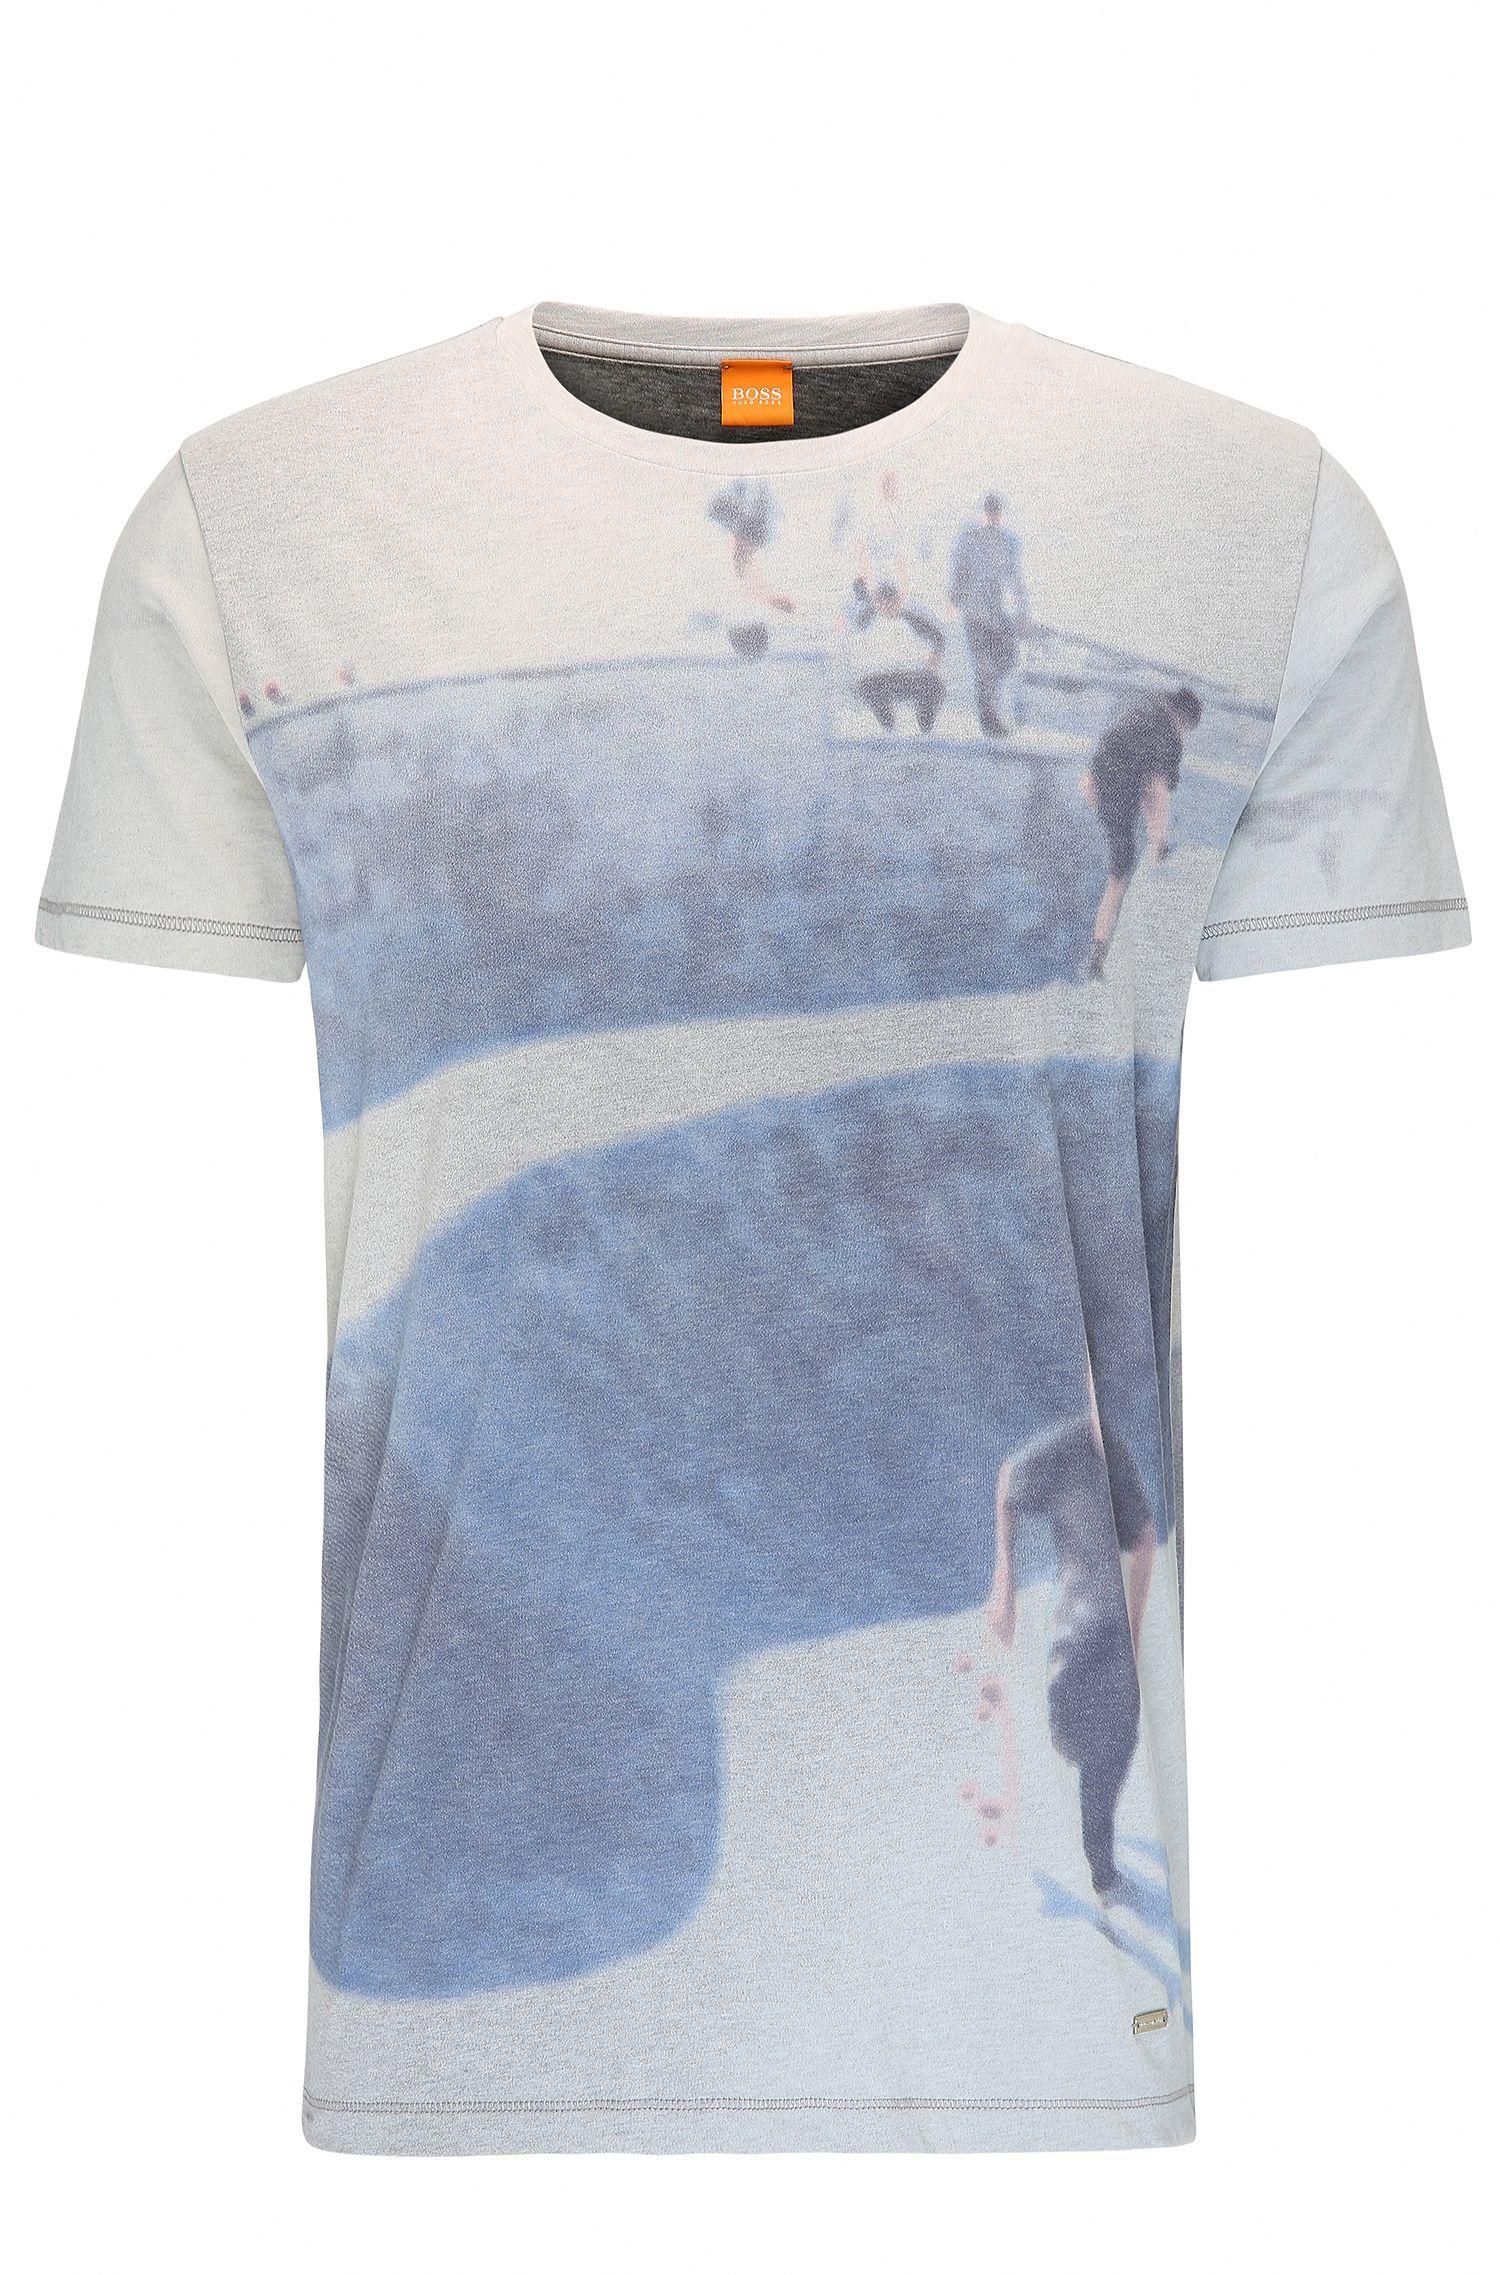 Printed Cotton T-Shirt | Tintype